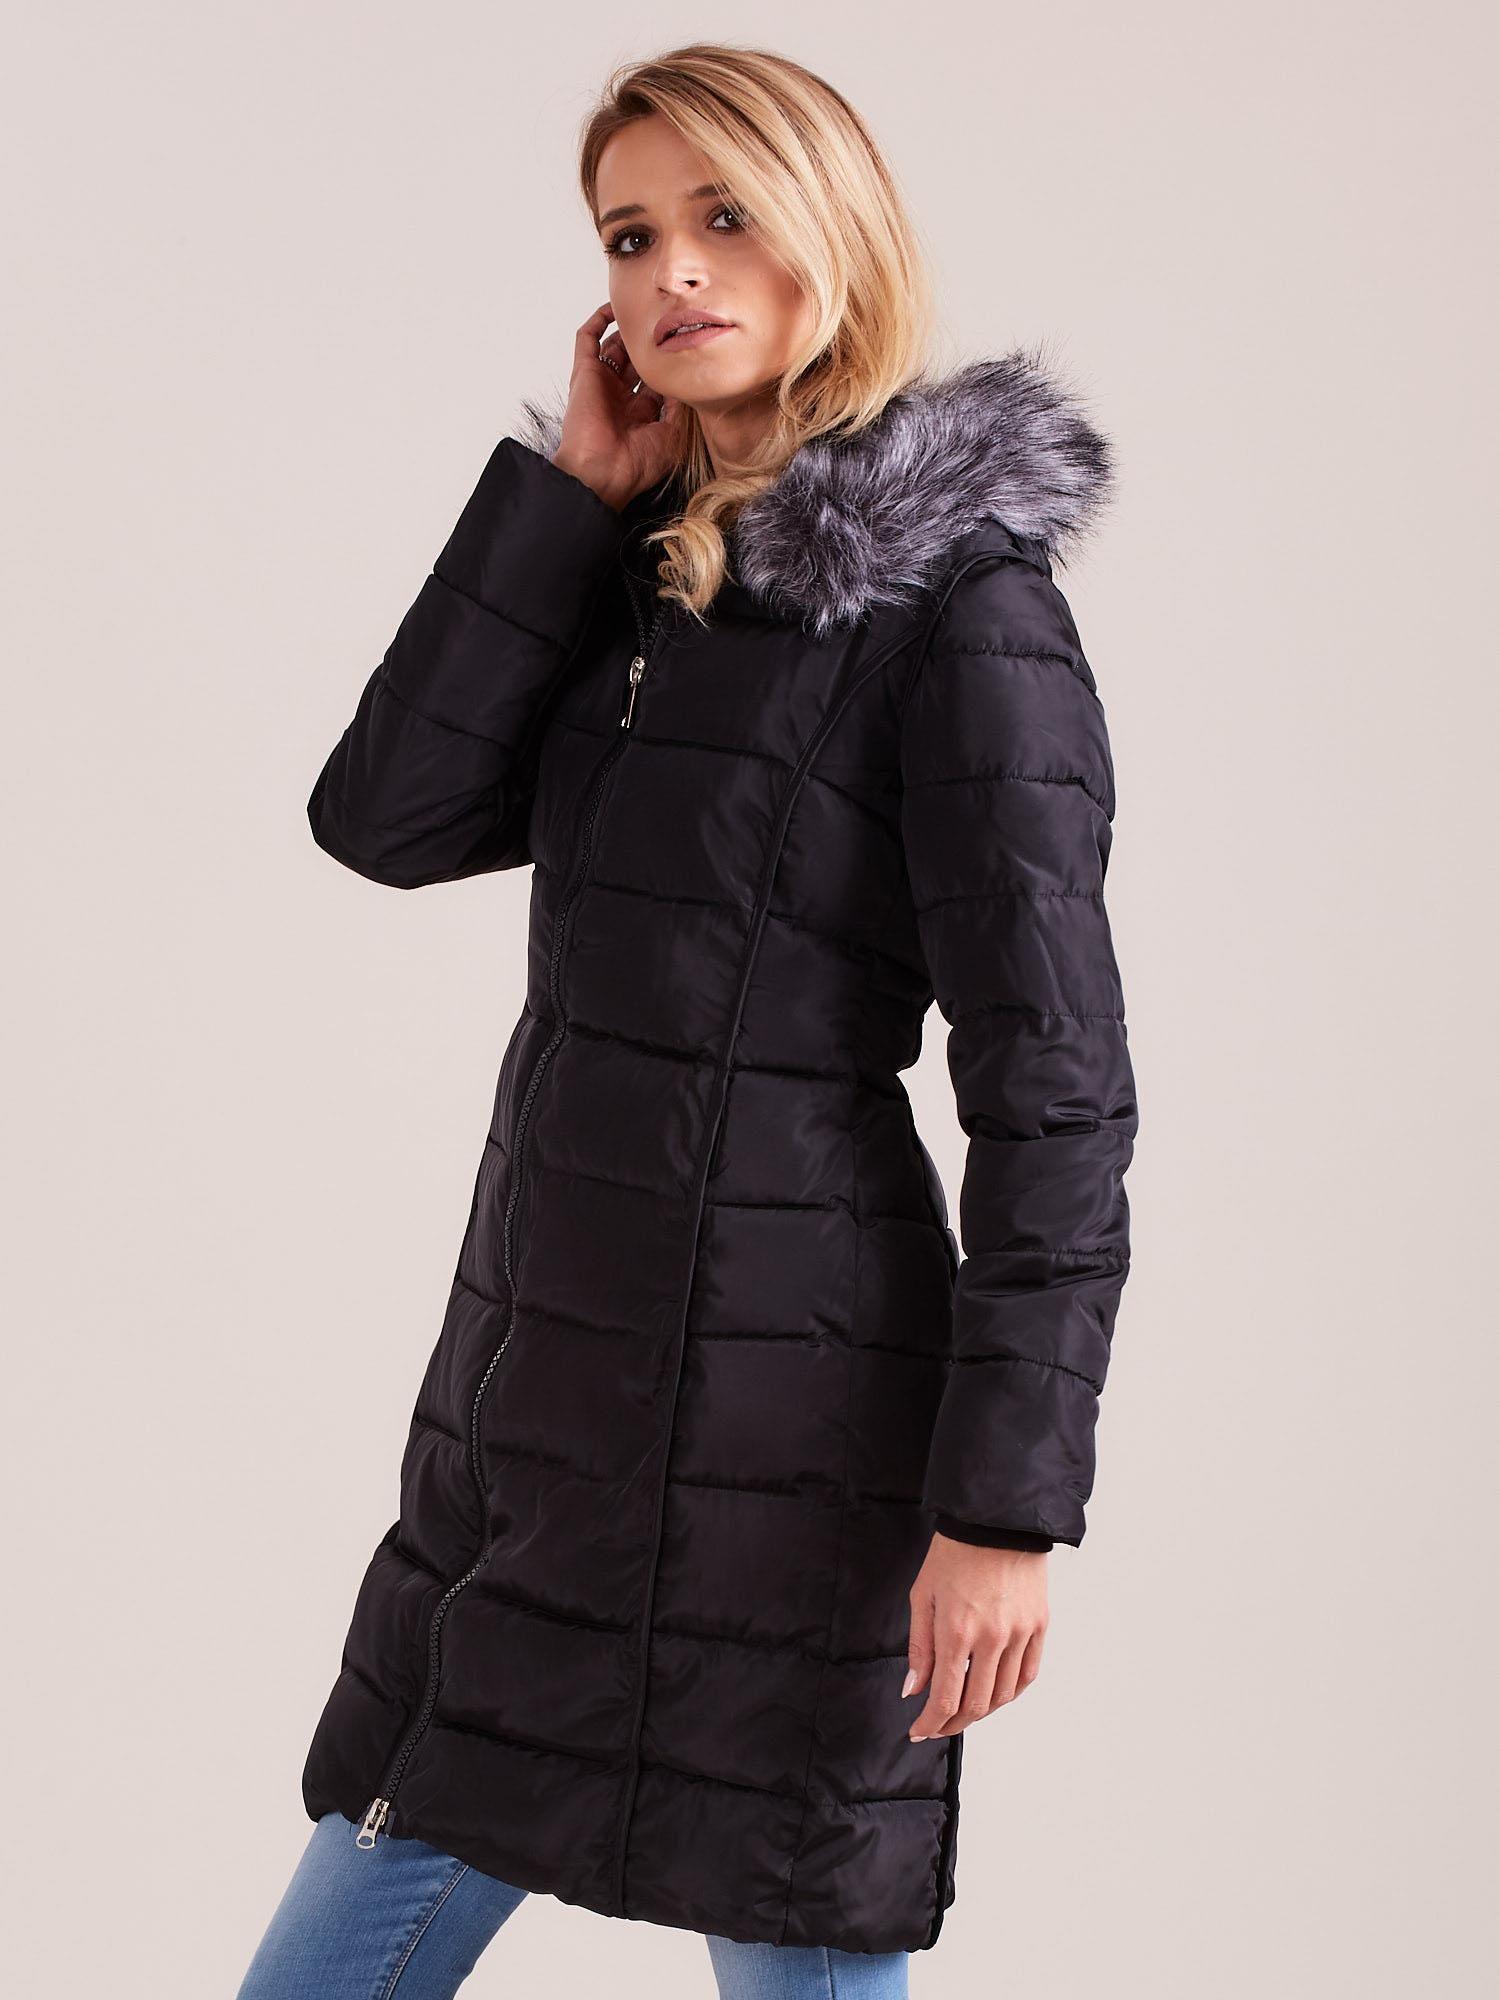 kurtka zimowa damksa pikowana